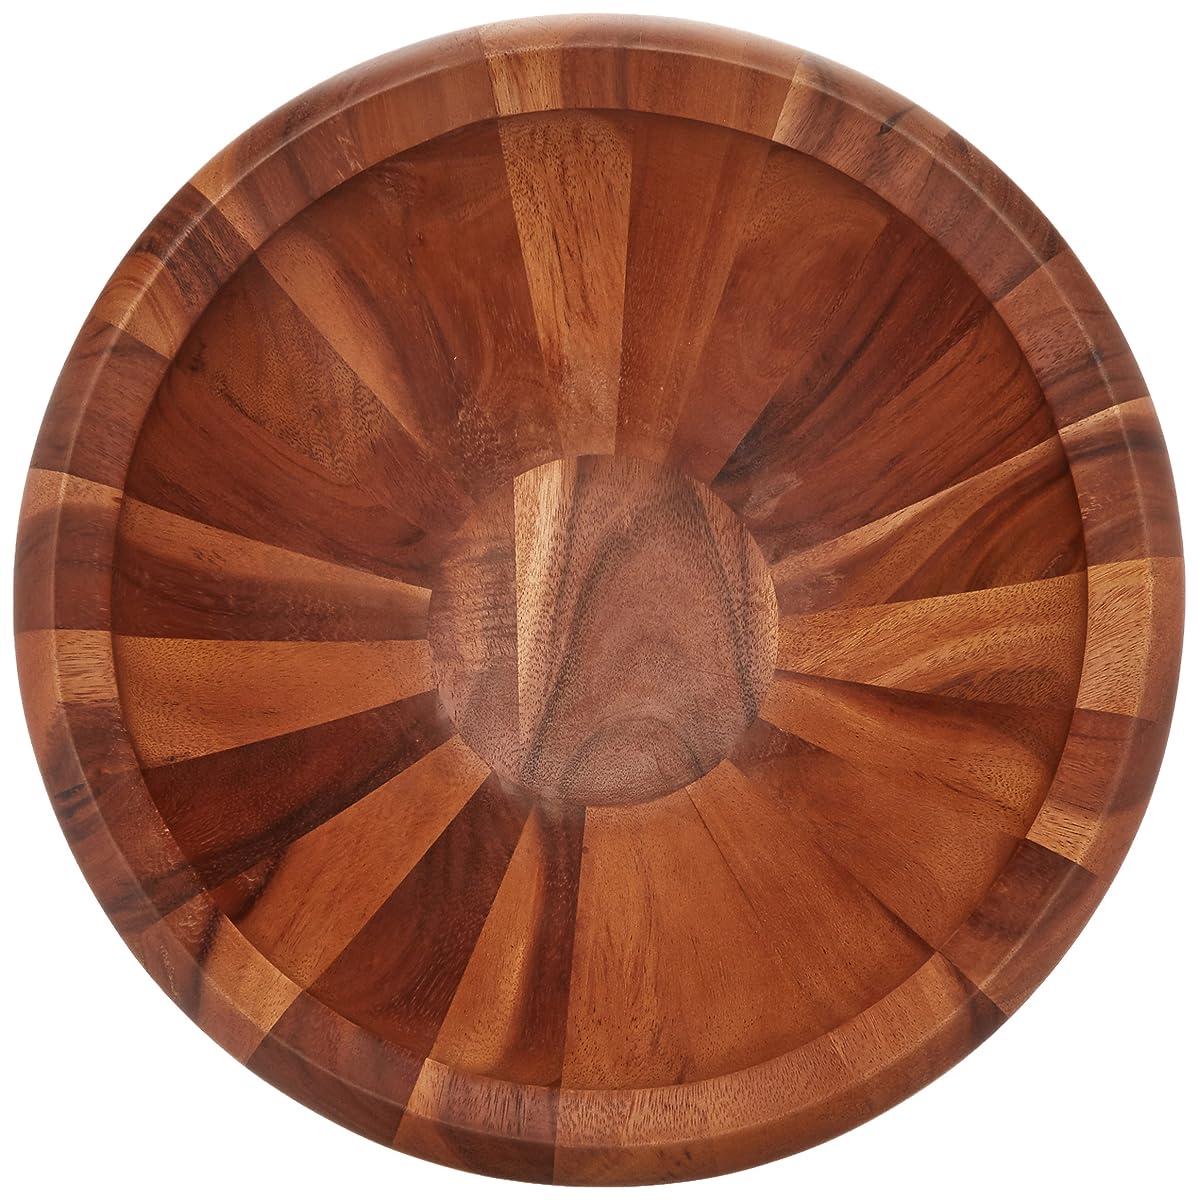 Wood Classics 16-Inch Round Salad Bowl